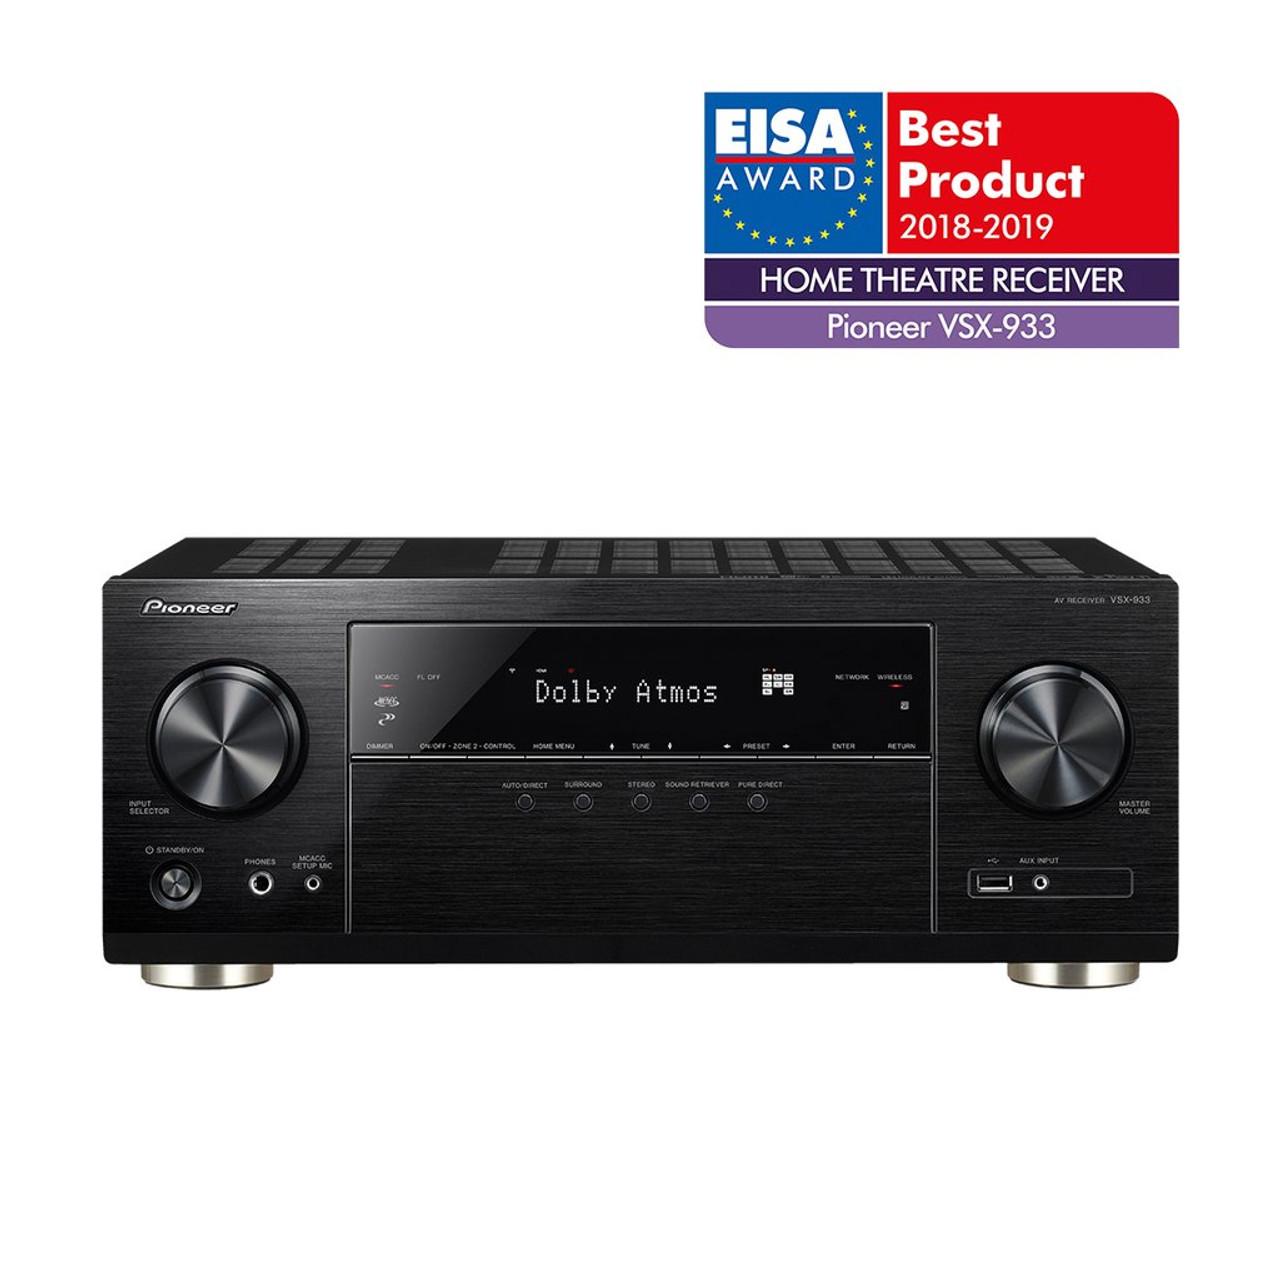 Pioneer VSX-933 7.2CH 4K UHD HDR Dolby Atmos AV Receiver